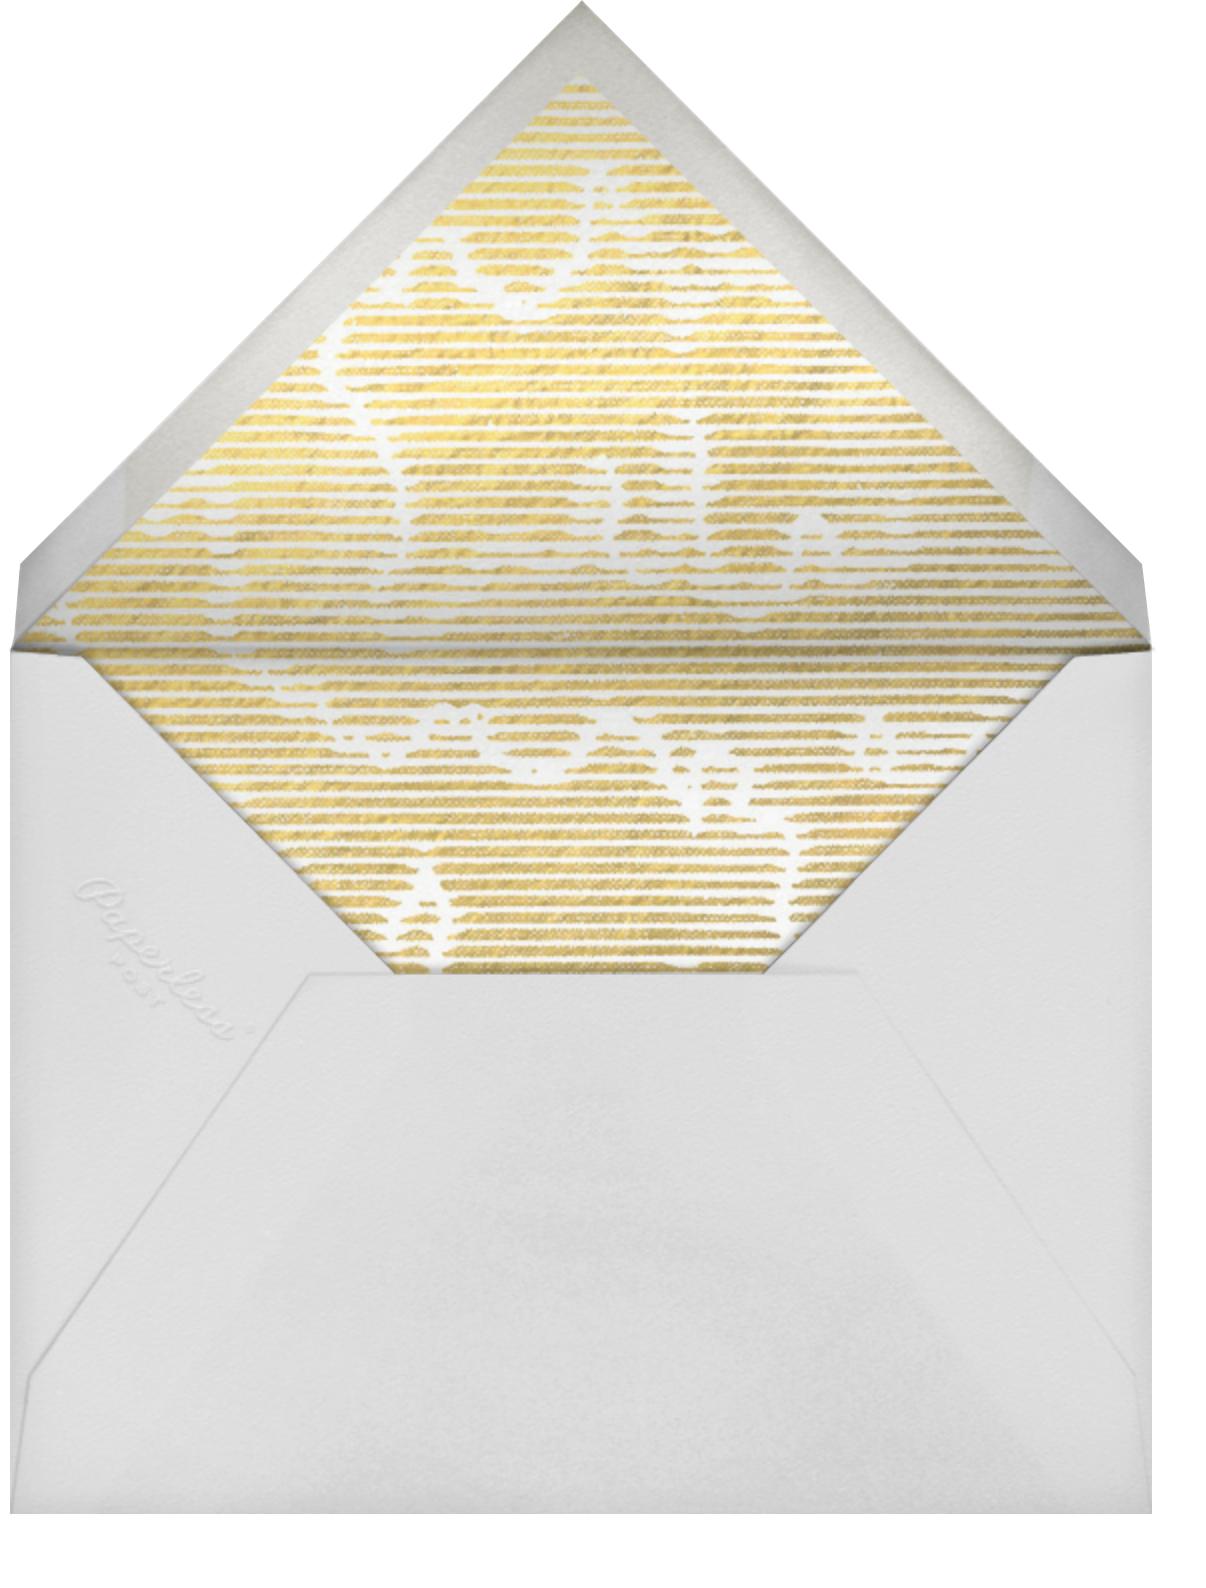 Acclaim - Kelly Wearstler - General entertaining - envelope back